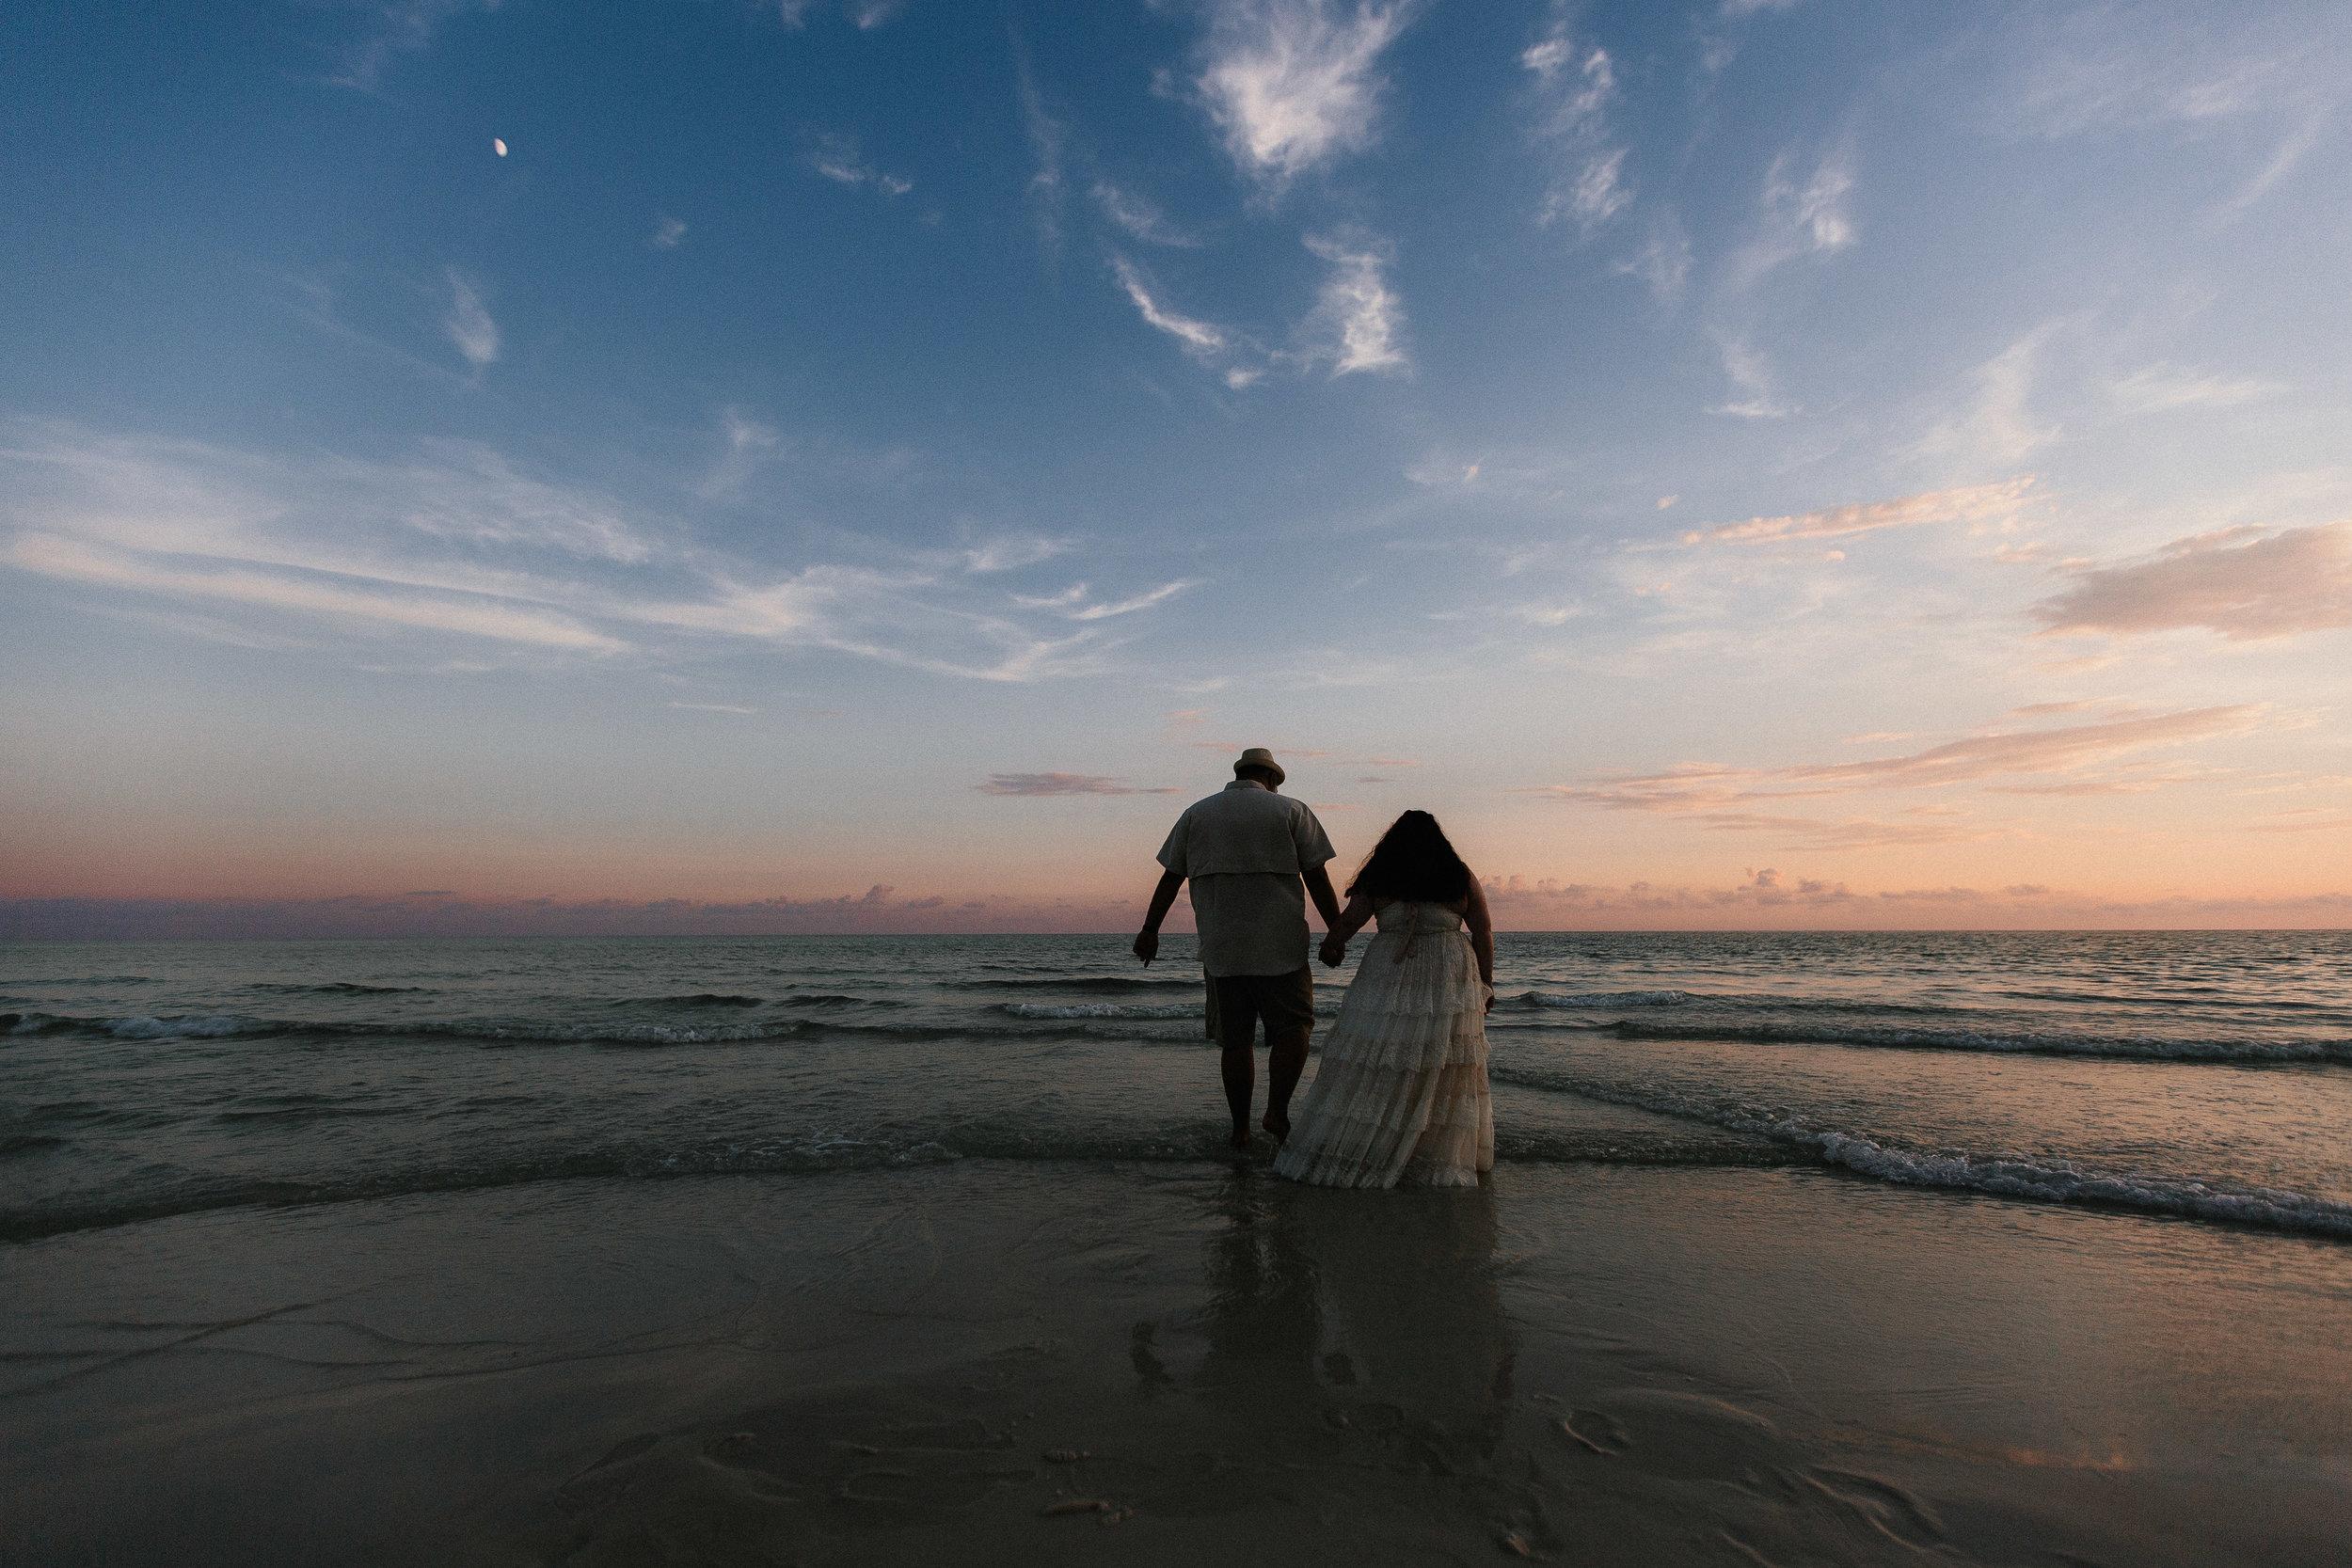 destin_sunset_beach_elopement_intimate_wedding_photographer_florida_documentary_1324.jpg